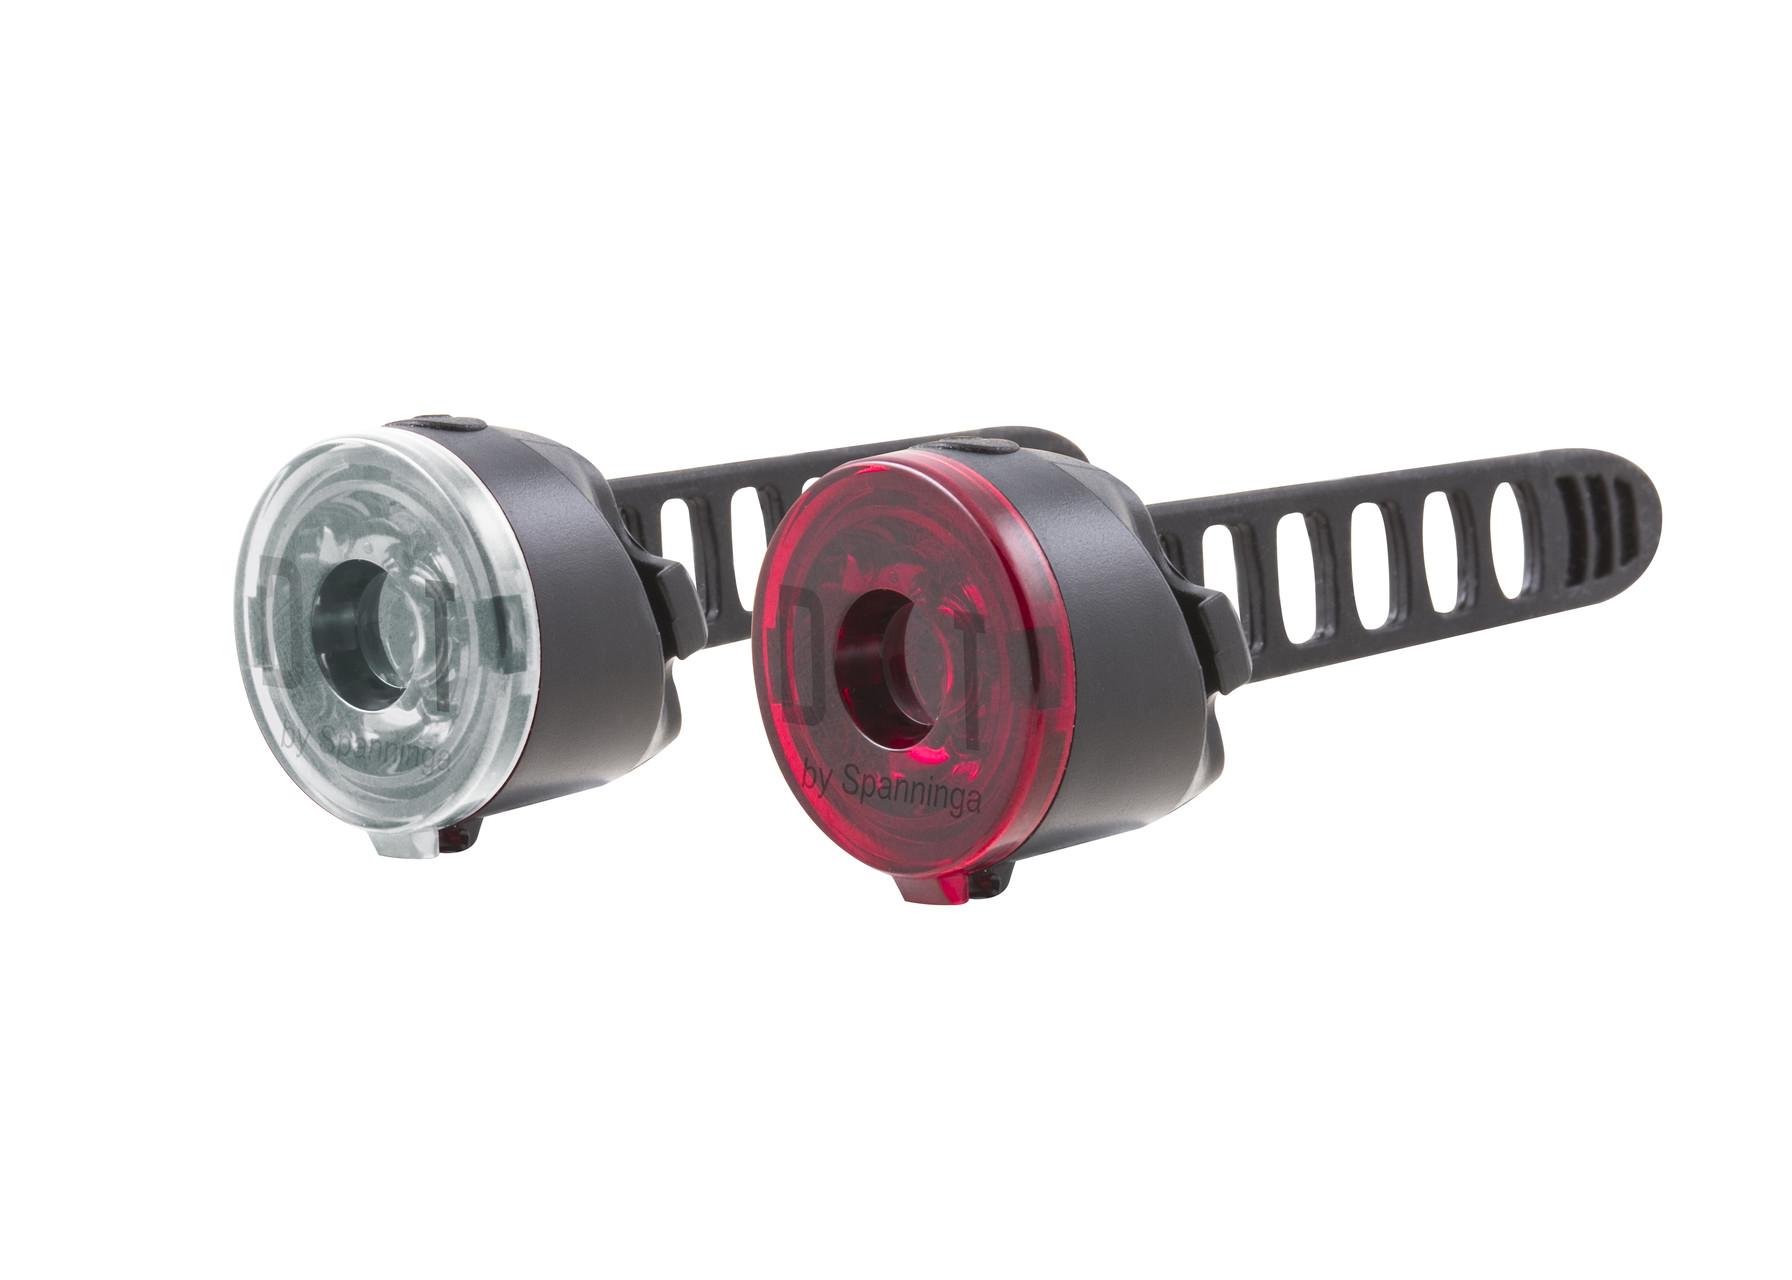 Spanninga Dot lygtesæt - 2 funktioner - 10 Lumen | Light Set